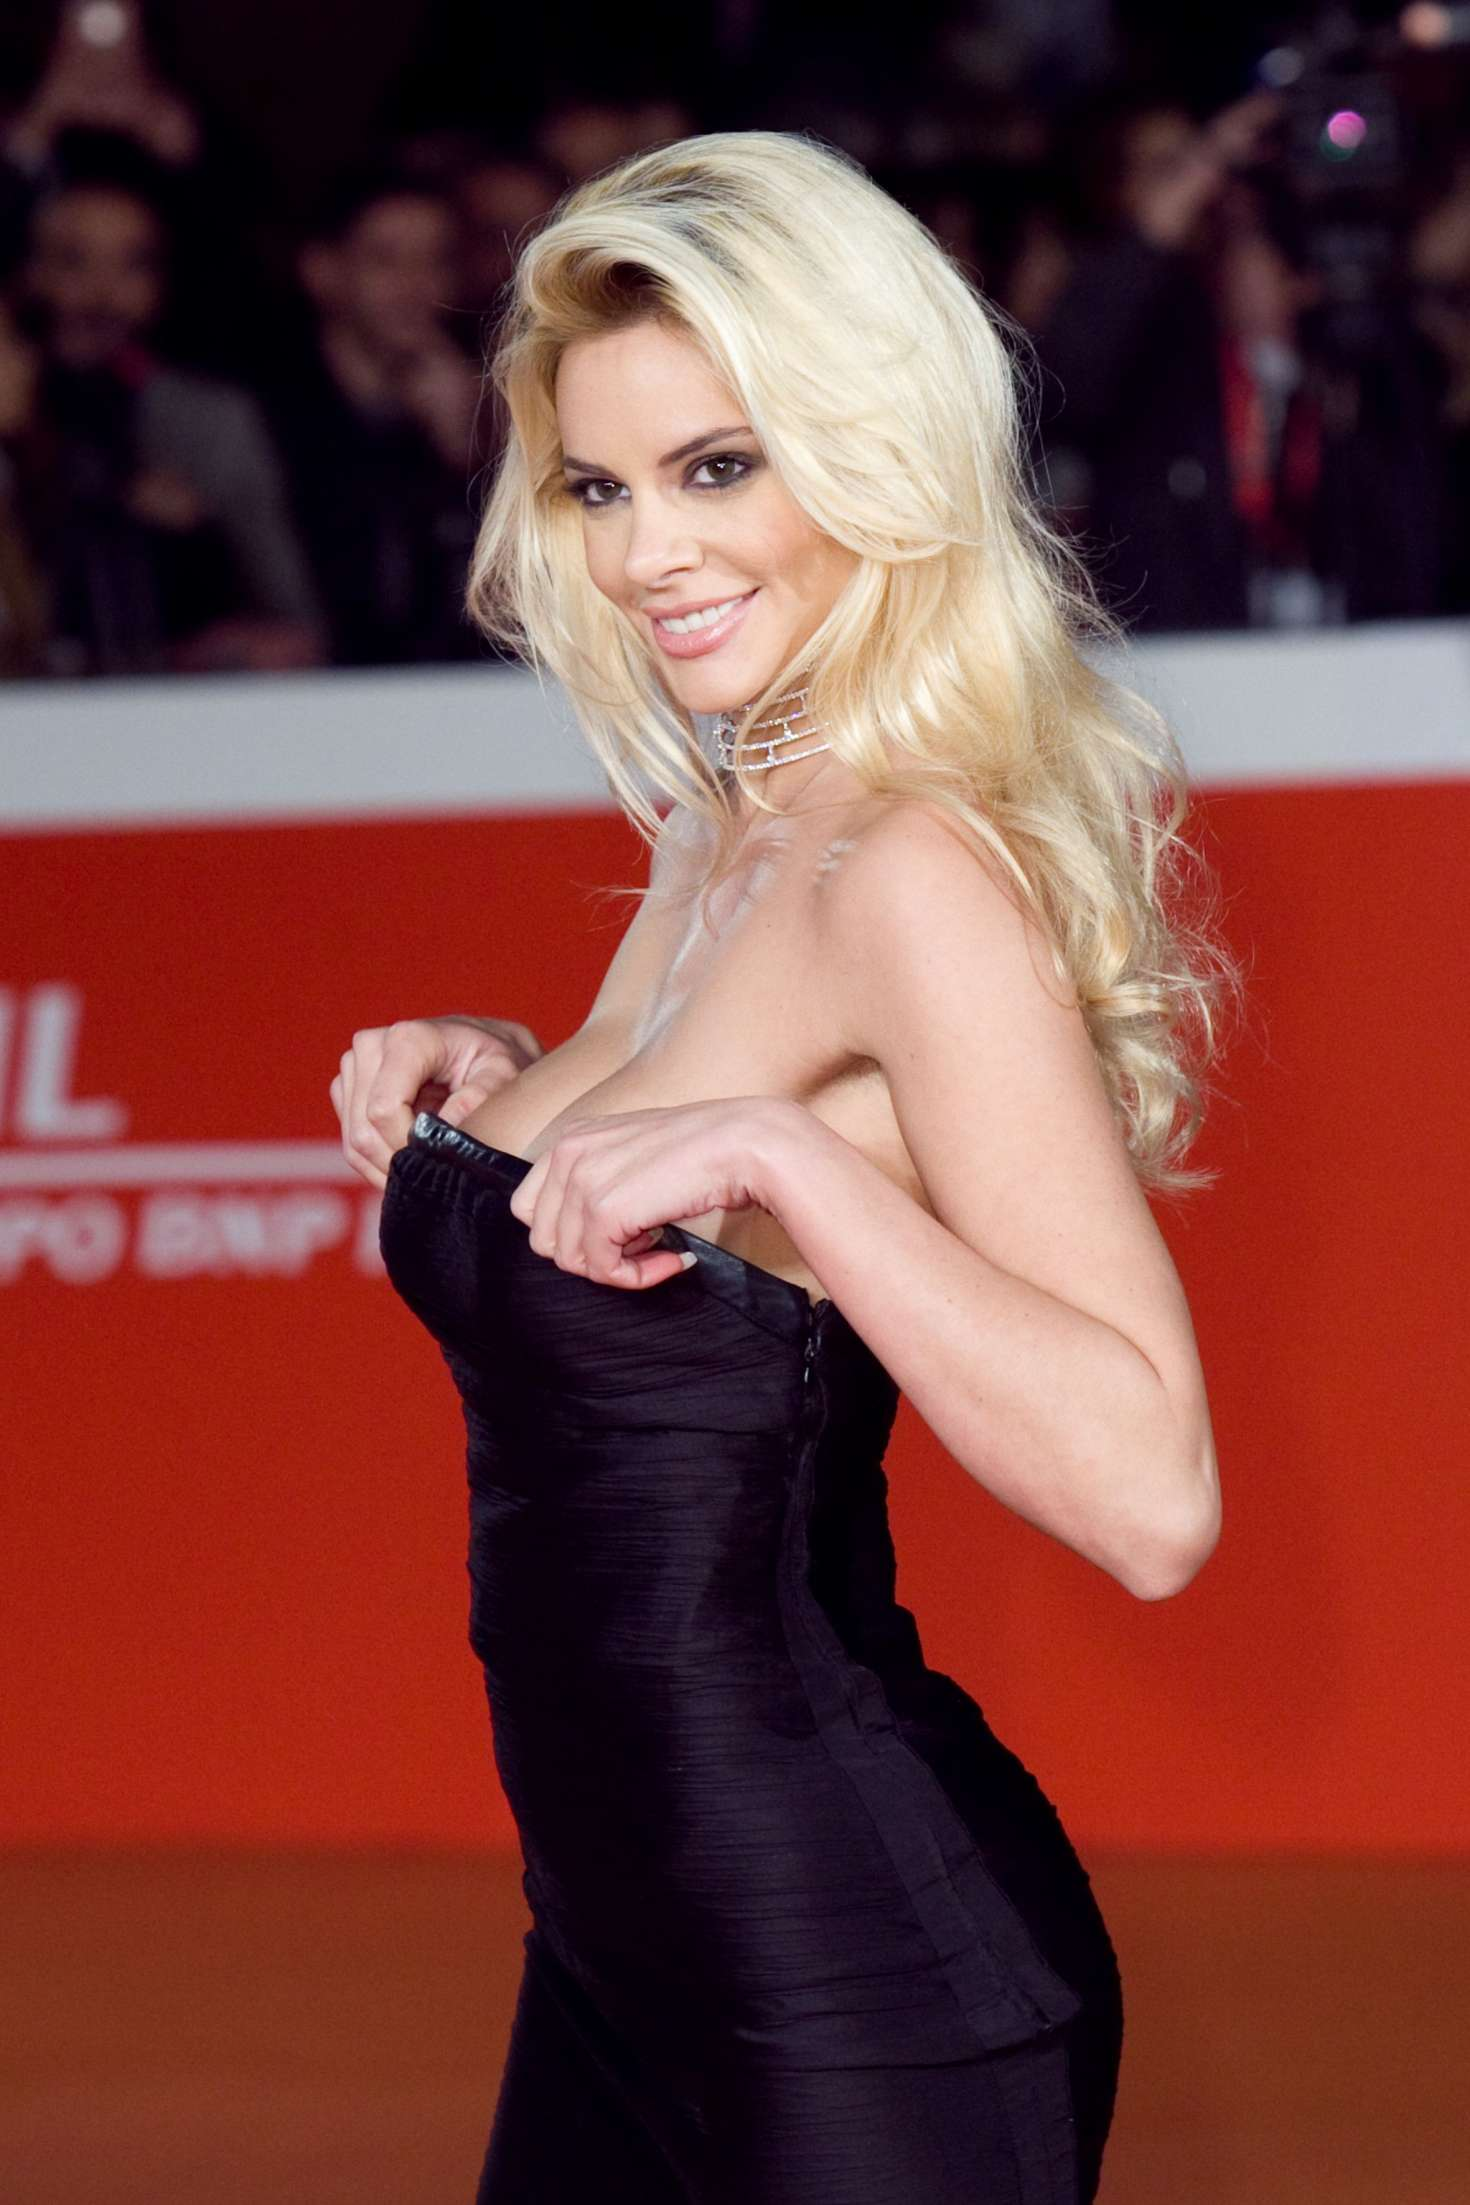 nudes (88 photos), Topless Celebrites photos